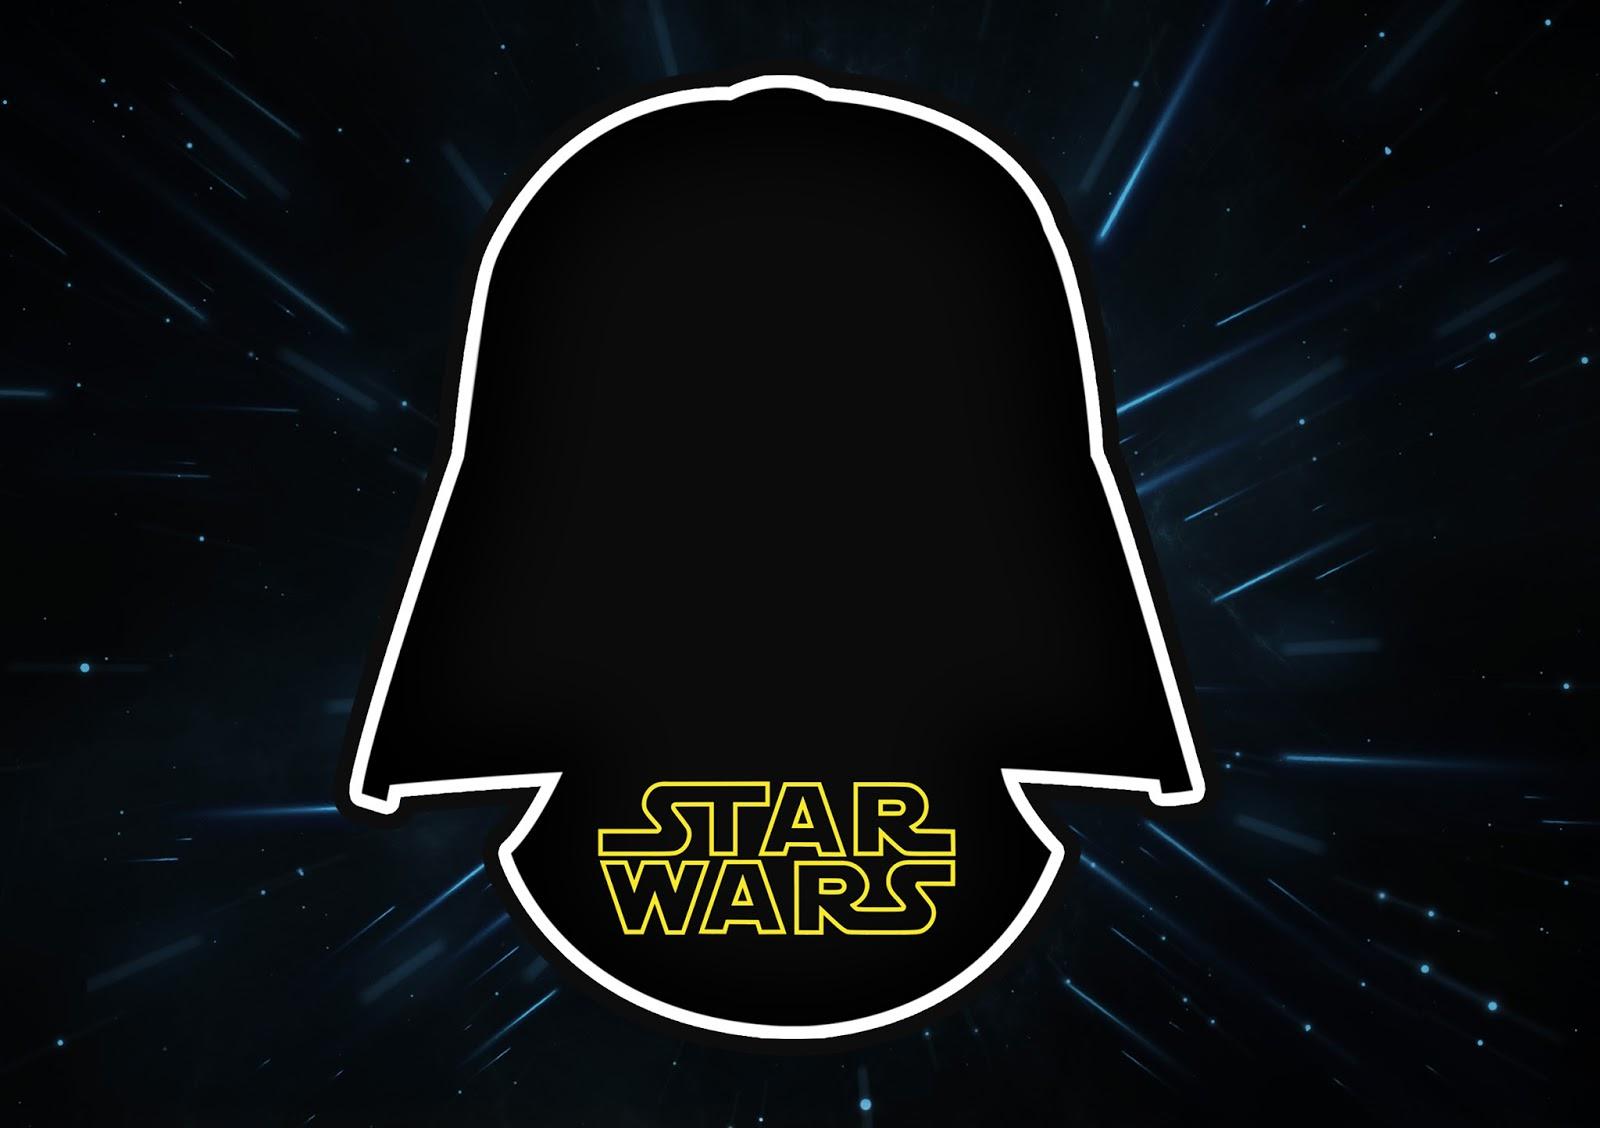 Star Wars: Free Printable Invitations. - Oh My Fiesta! For Geeks - Star Wars Printable Cards Free